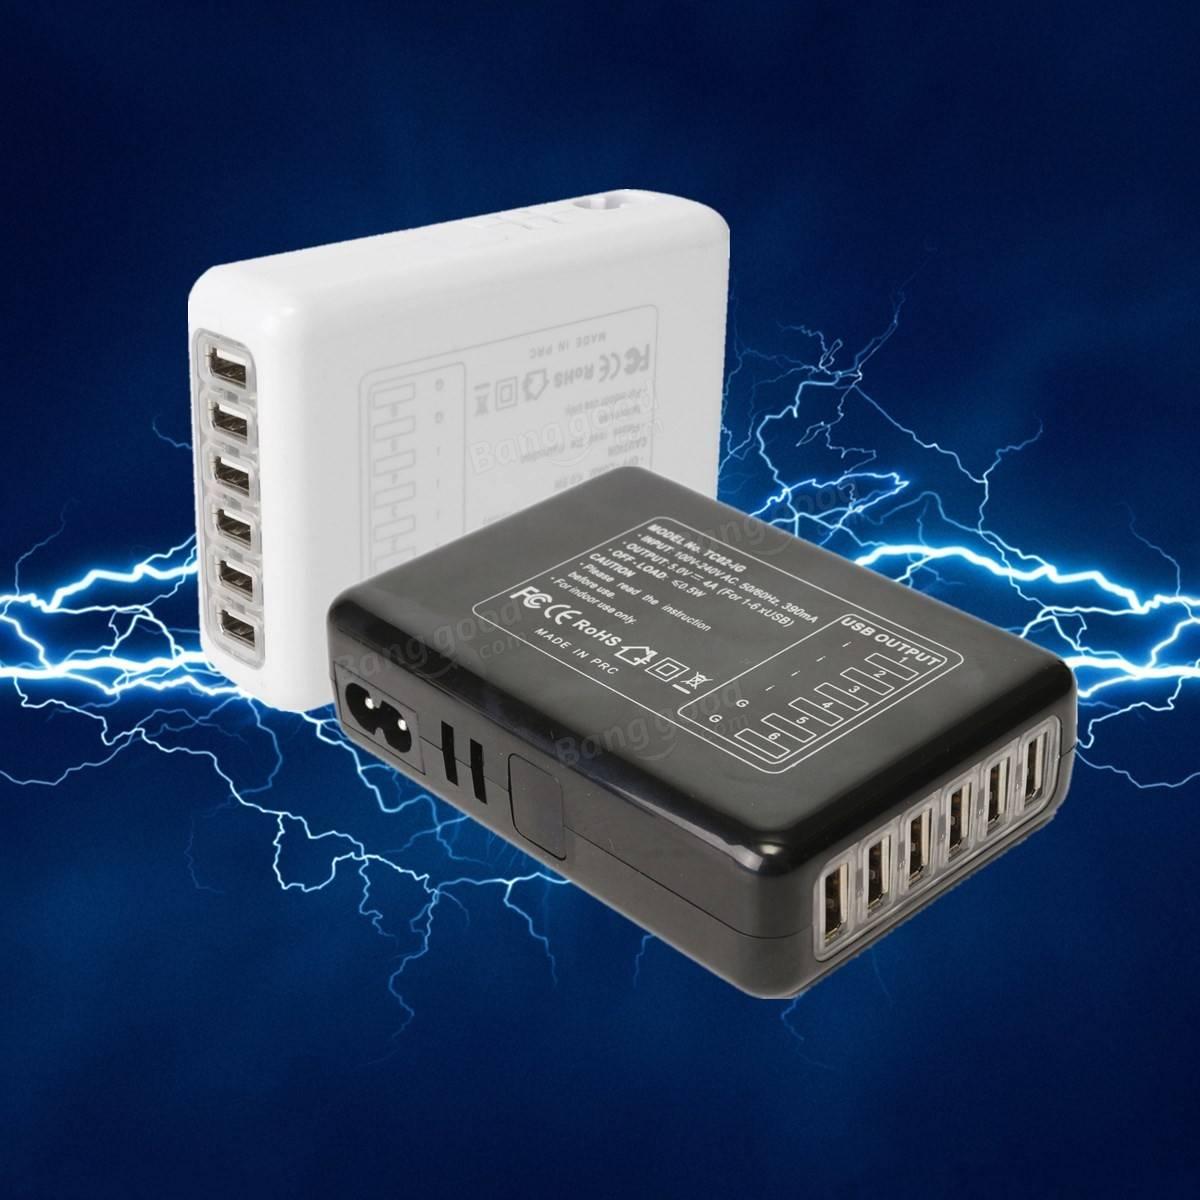 Mini Multi Port Adapter 6 Travel Usb Ac Power Charger With Uk Eu Us Au Plug Sale Banggood Com